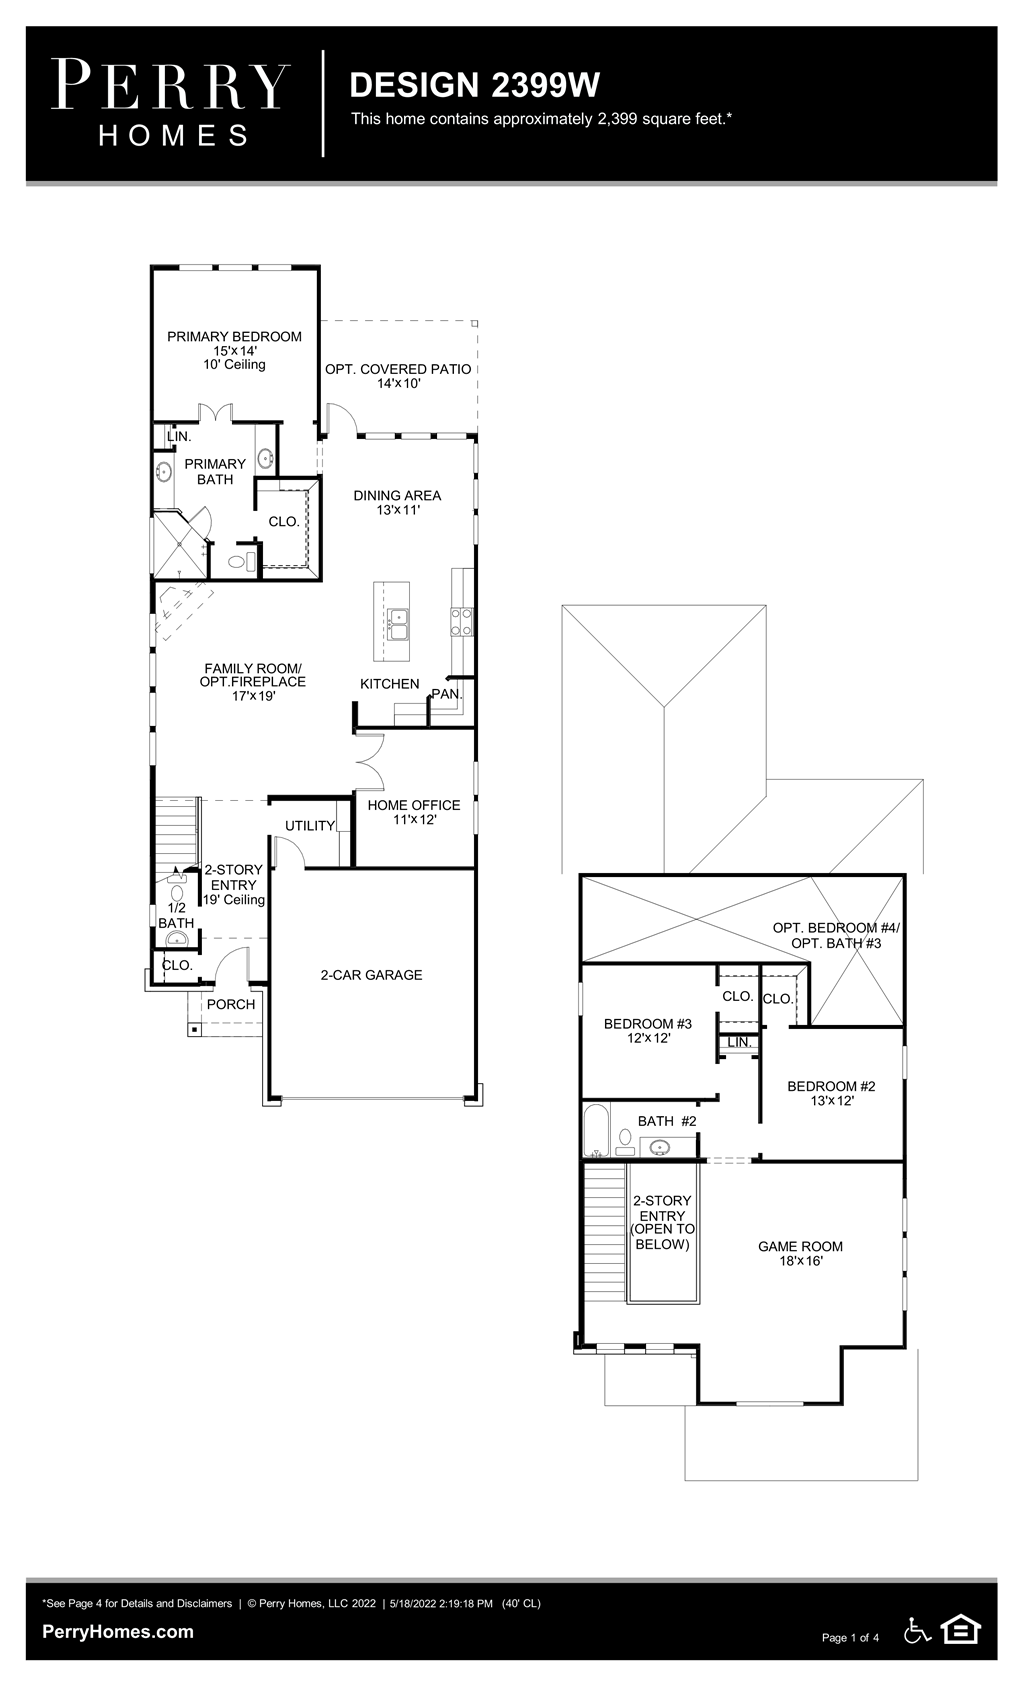 Floor Plan for 2399W